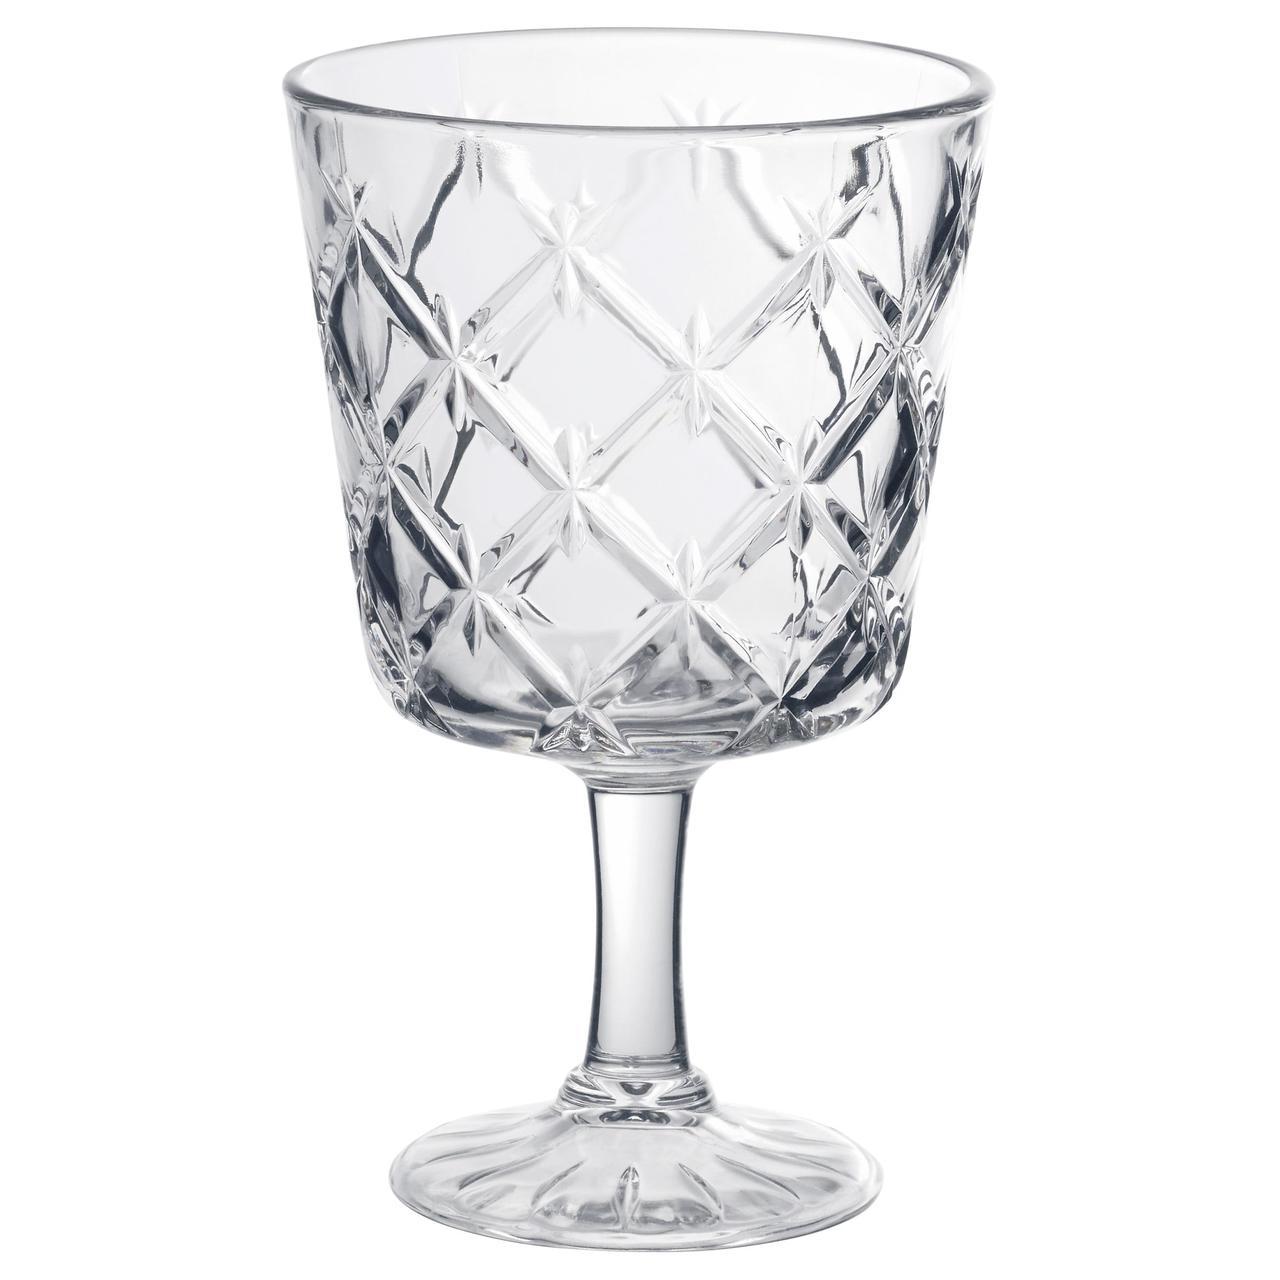 ФЛИМРА Бокал, прозрачное стекло, с рисунком